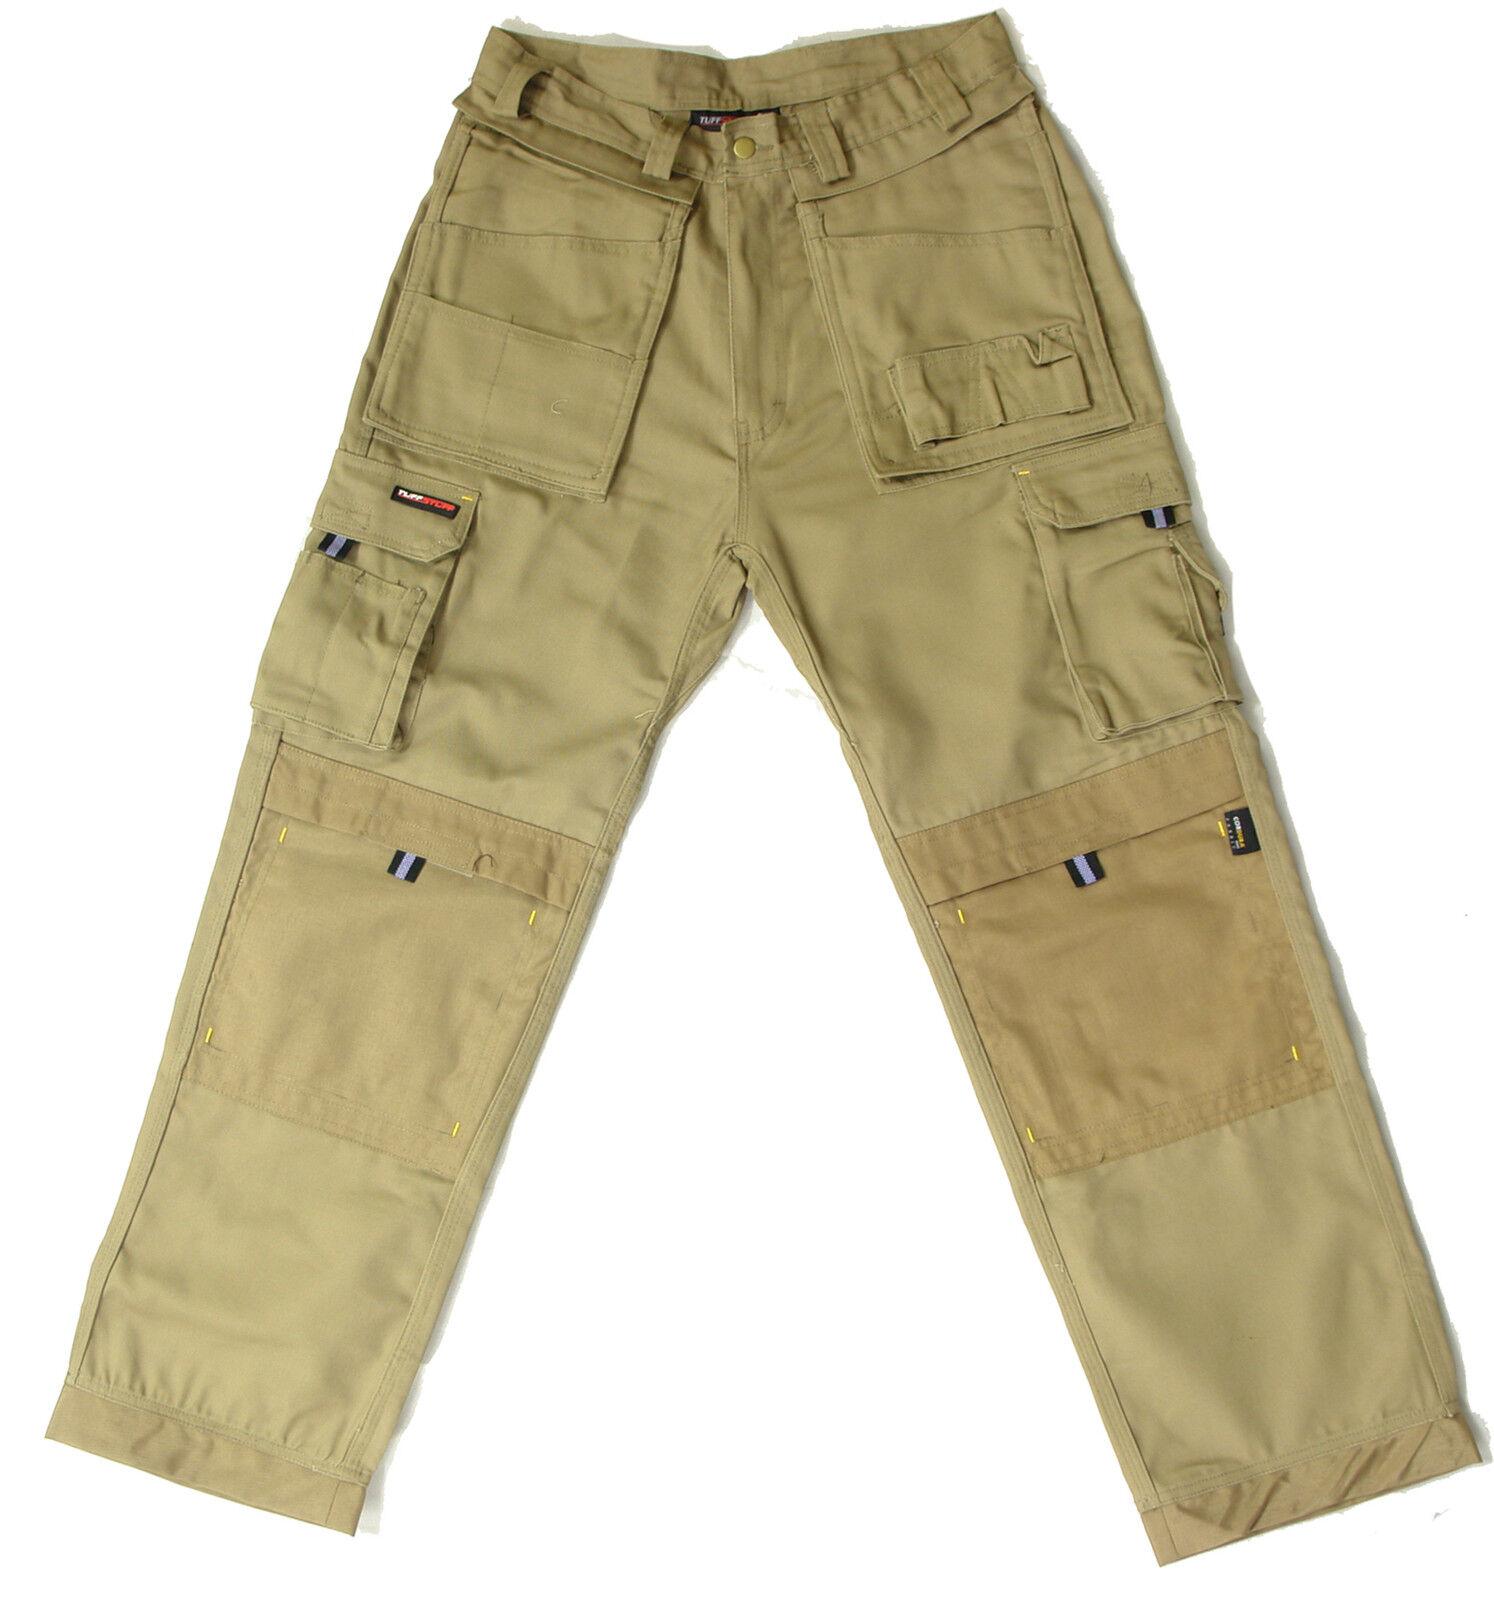 2 Pares de tuff Extremo Pantalón Trabajo Cordura Rodillera Bolsillo Resistente